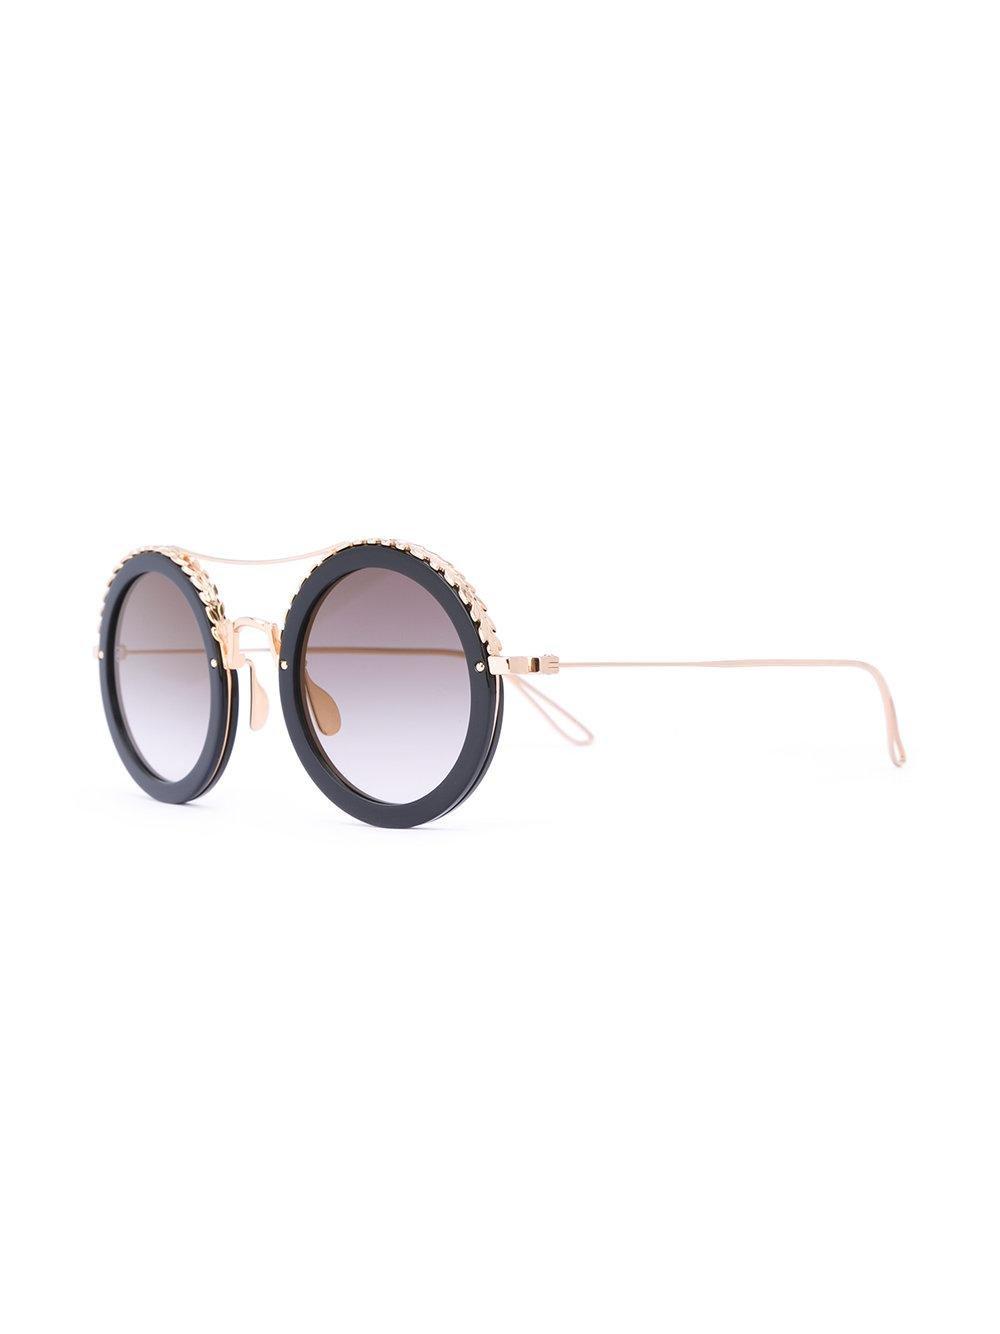 Elie Saab Round Sunglasses in Metallic